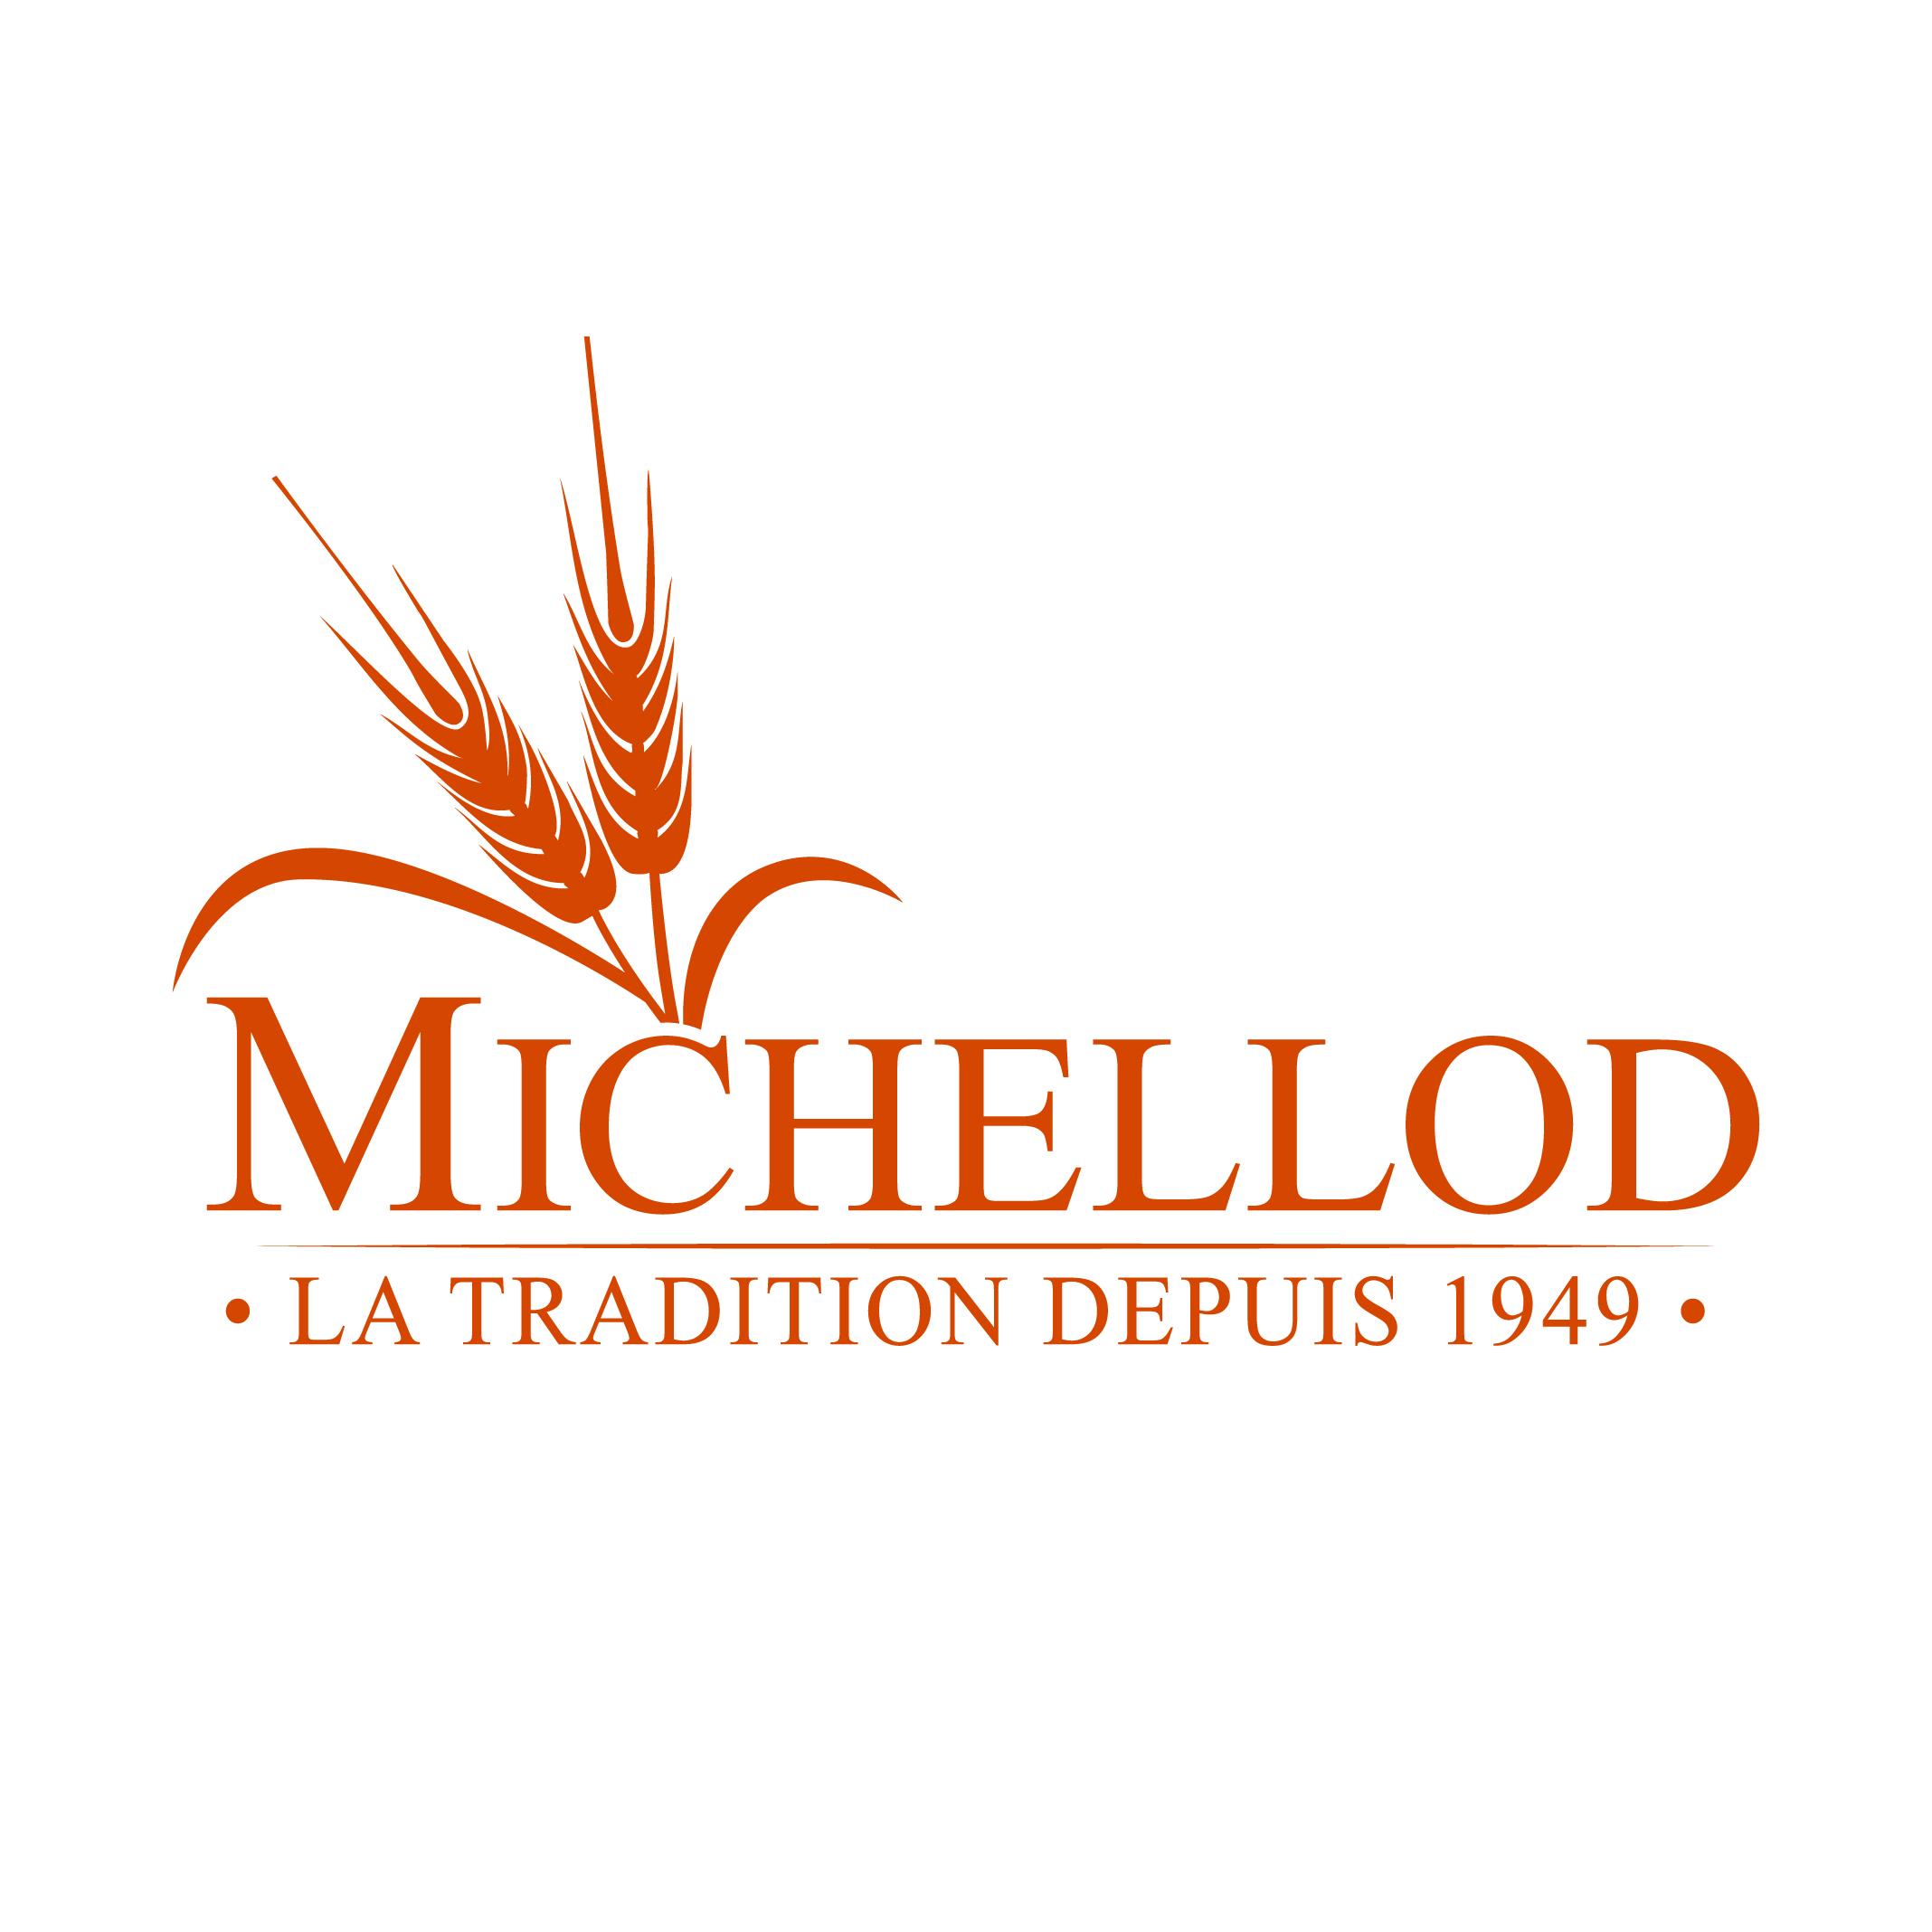 Boulangerie/Tea-Room Michellod